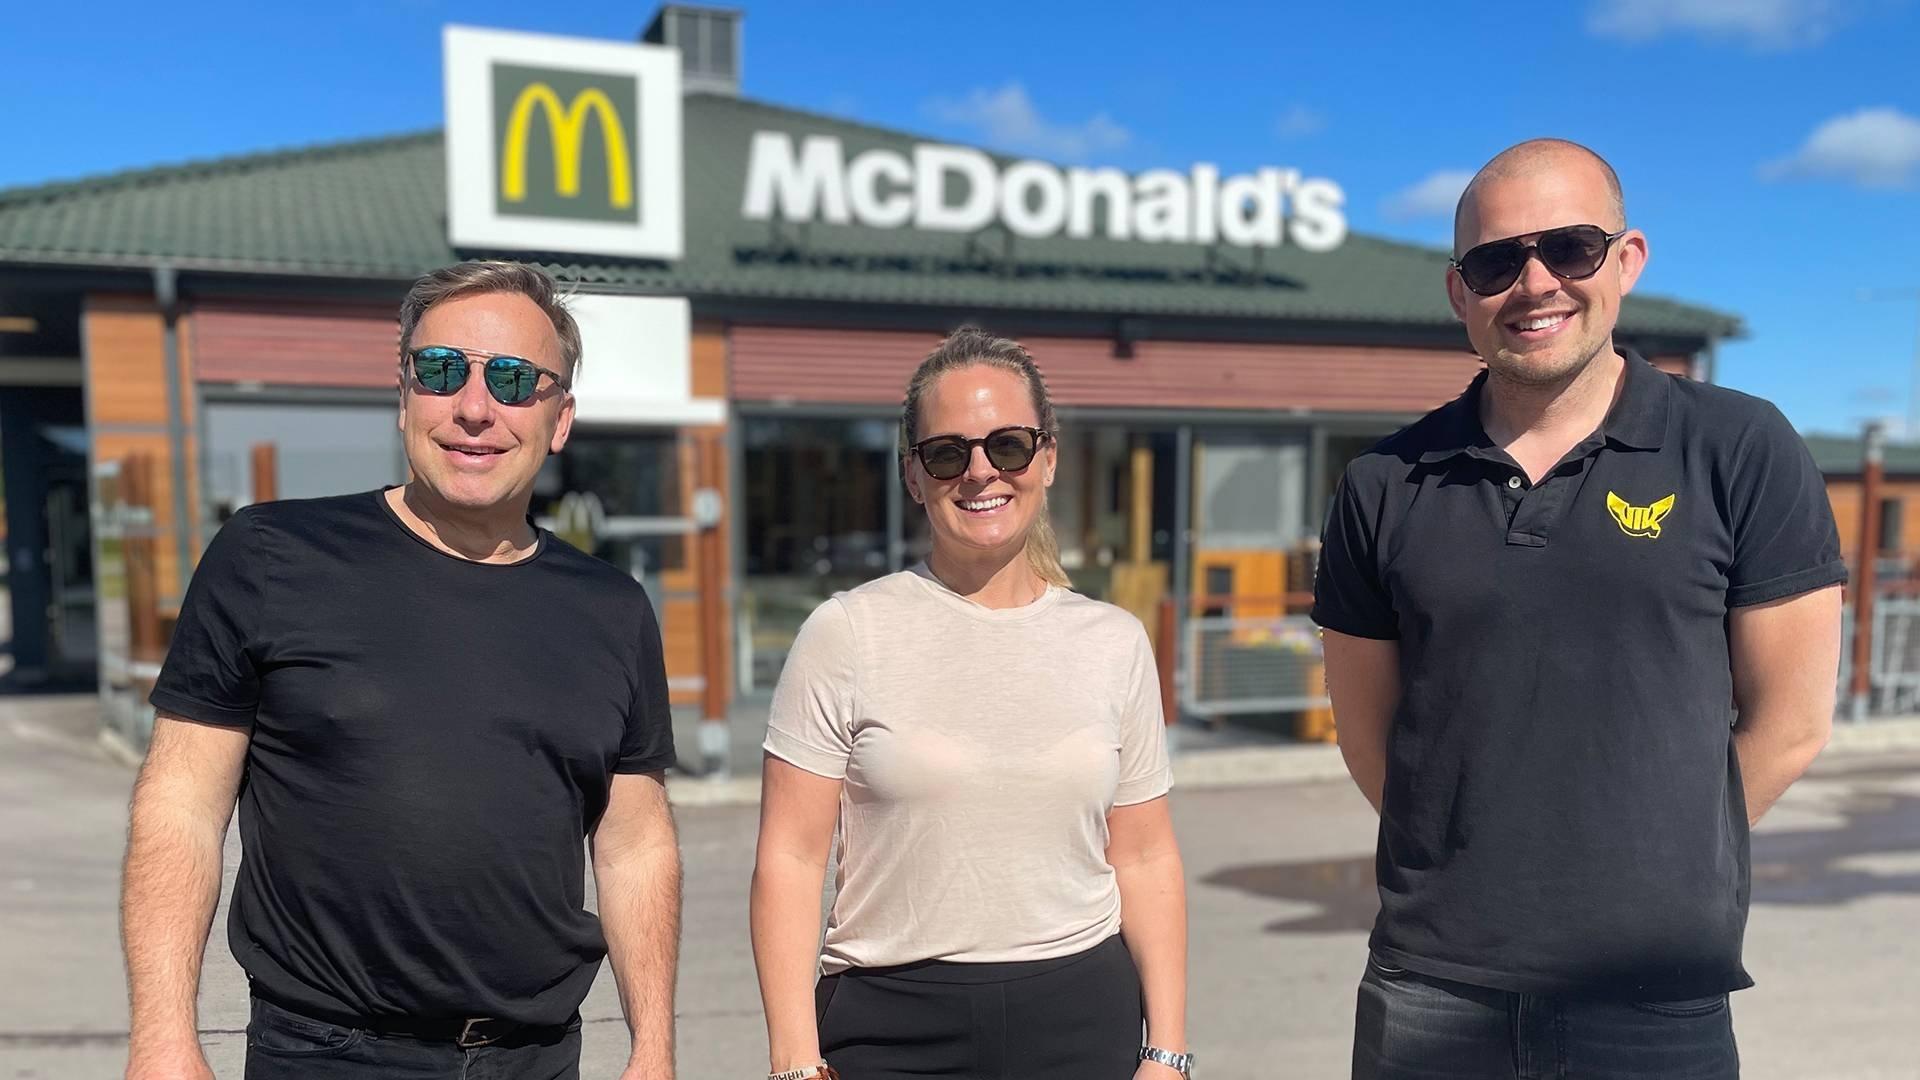 McDonald's blir ny Diamantpartner